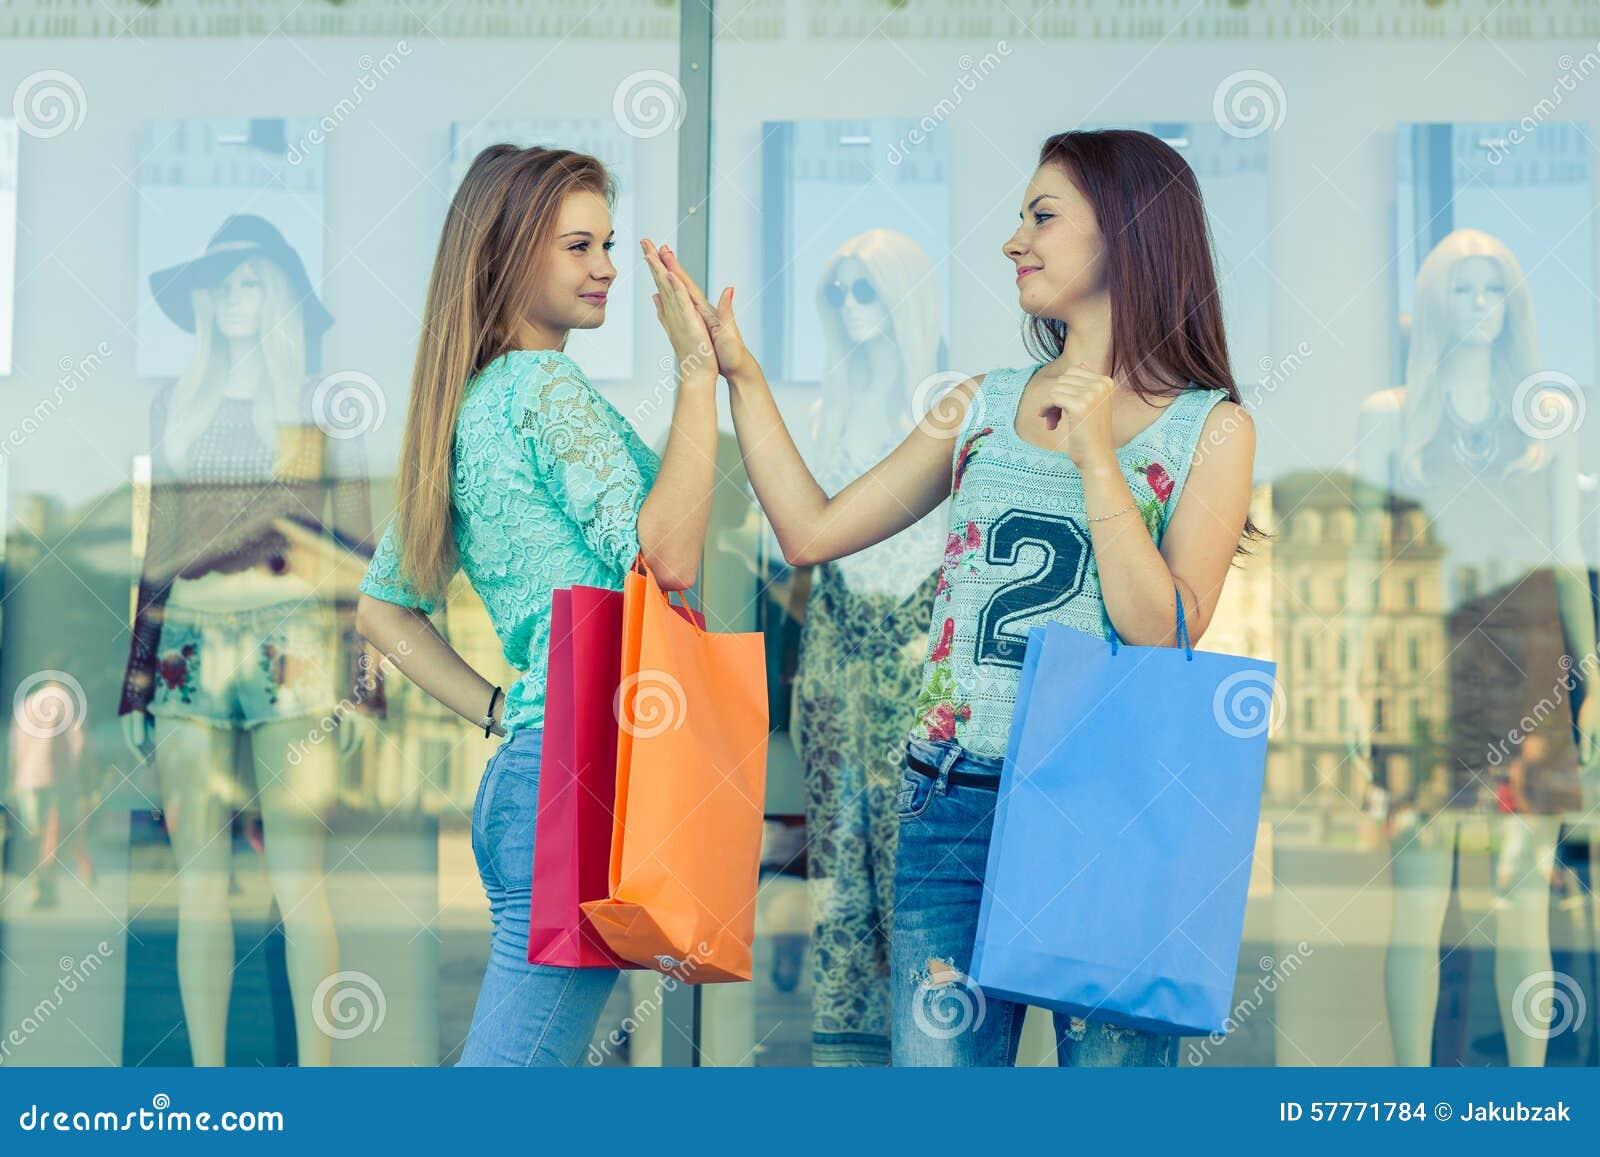 Customer satisfaction of tvc sky shop